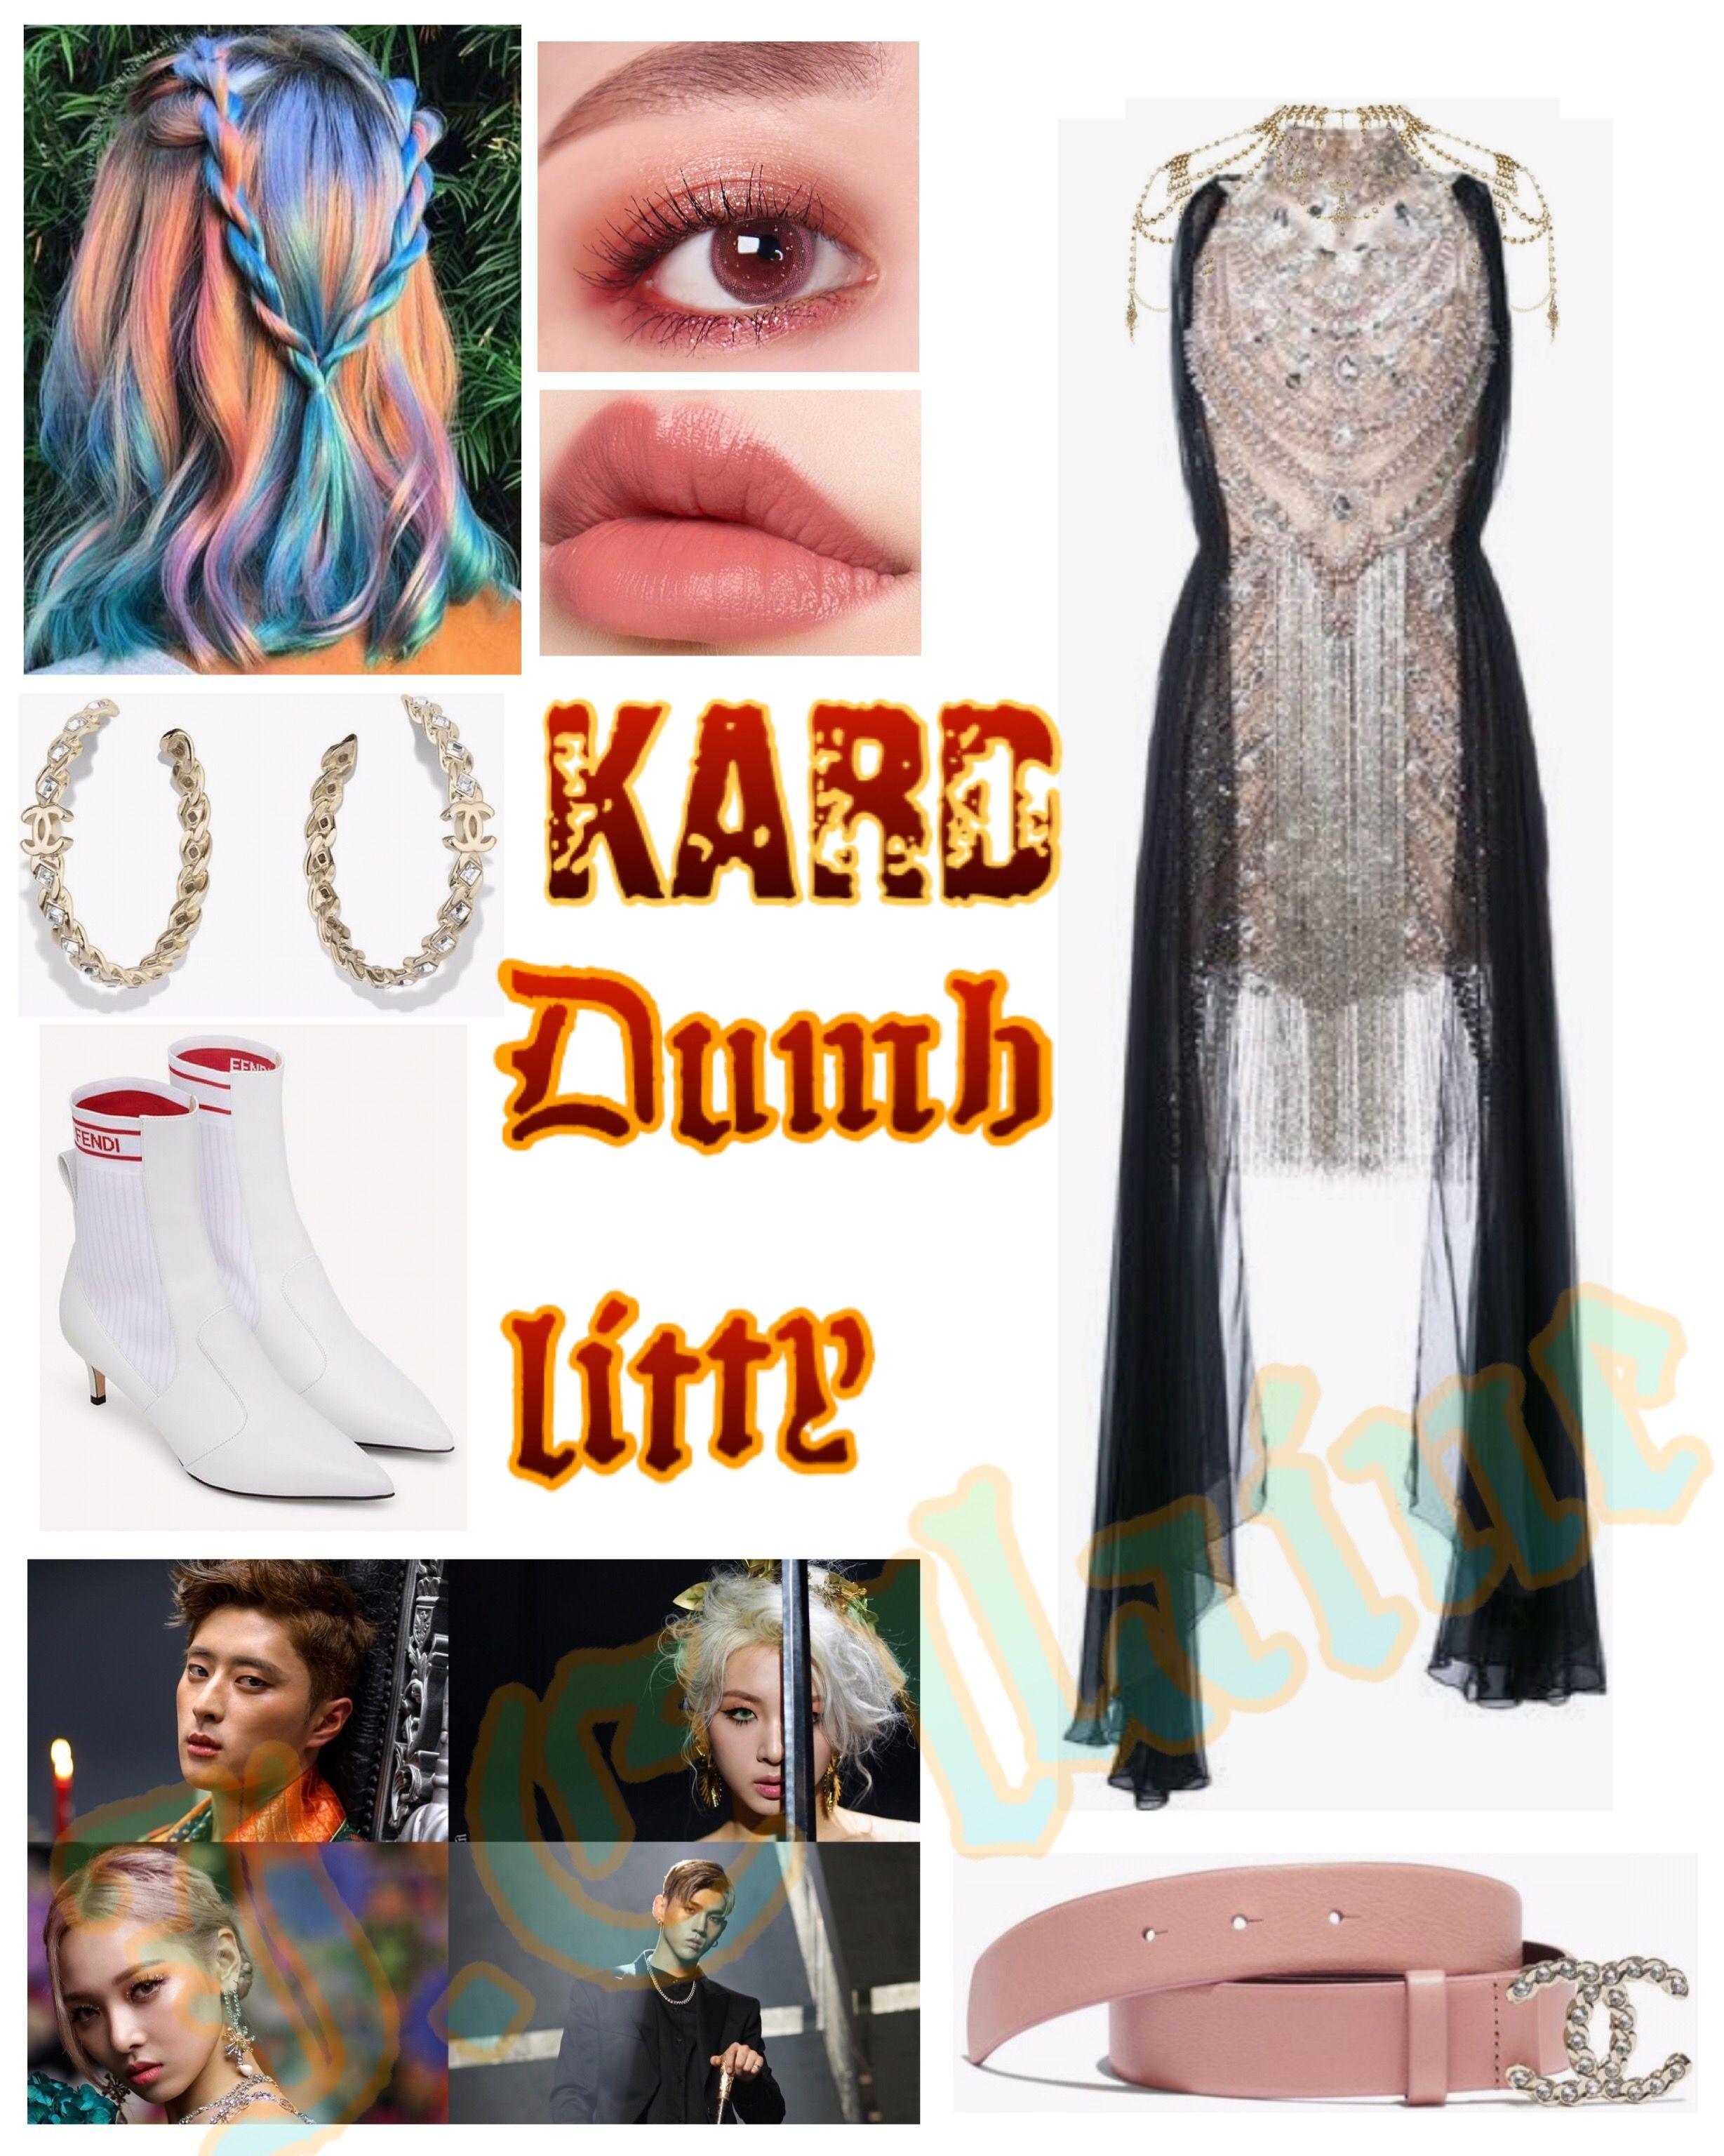 #Kpop #Girlgroup #kard #dumblitty #outfit #fashion # ...